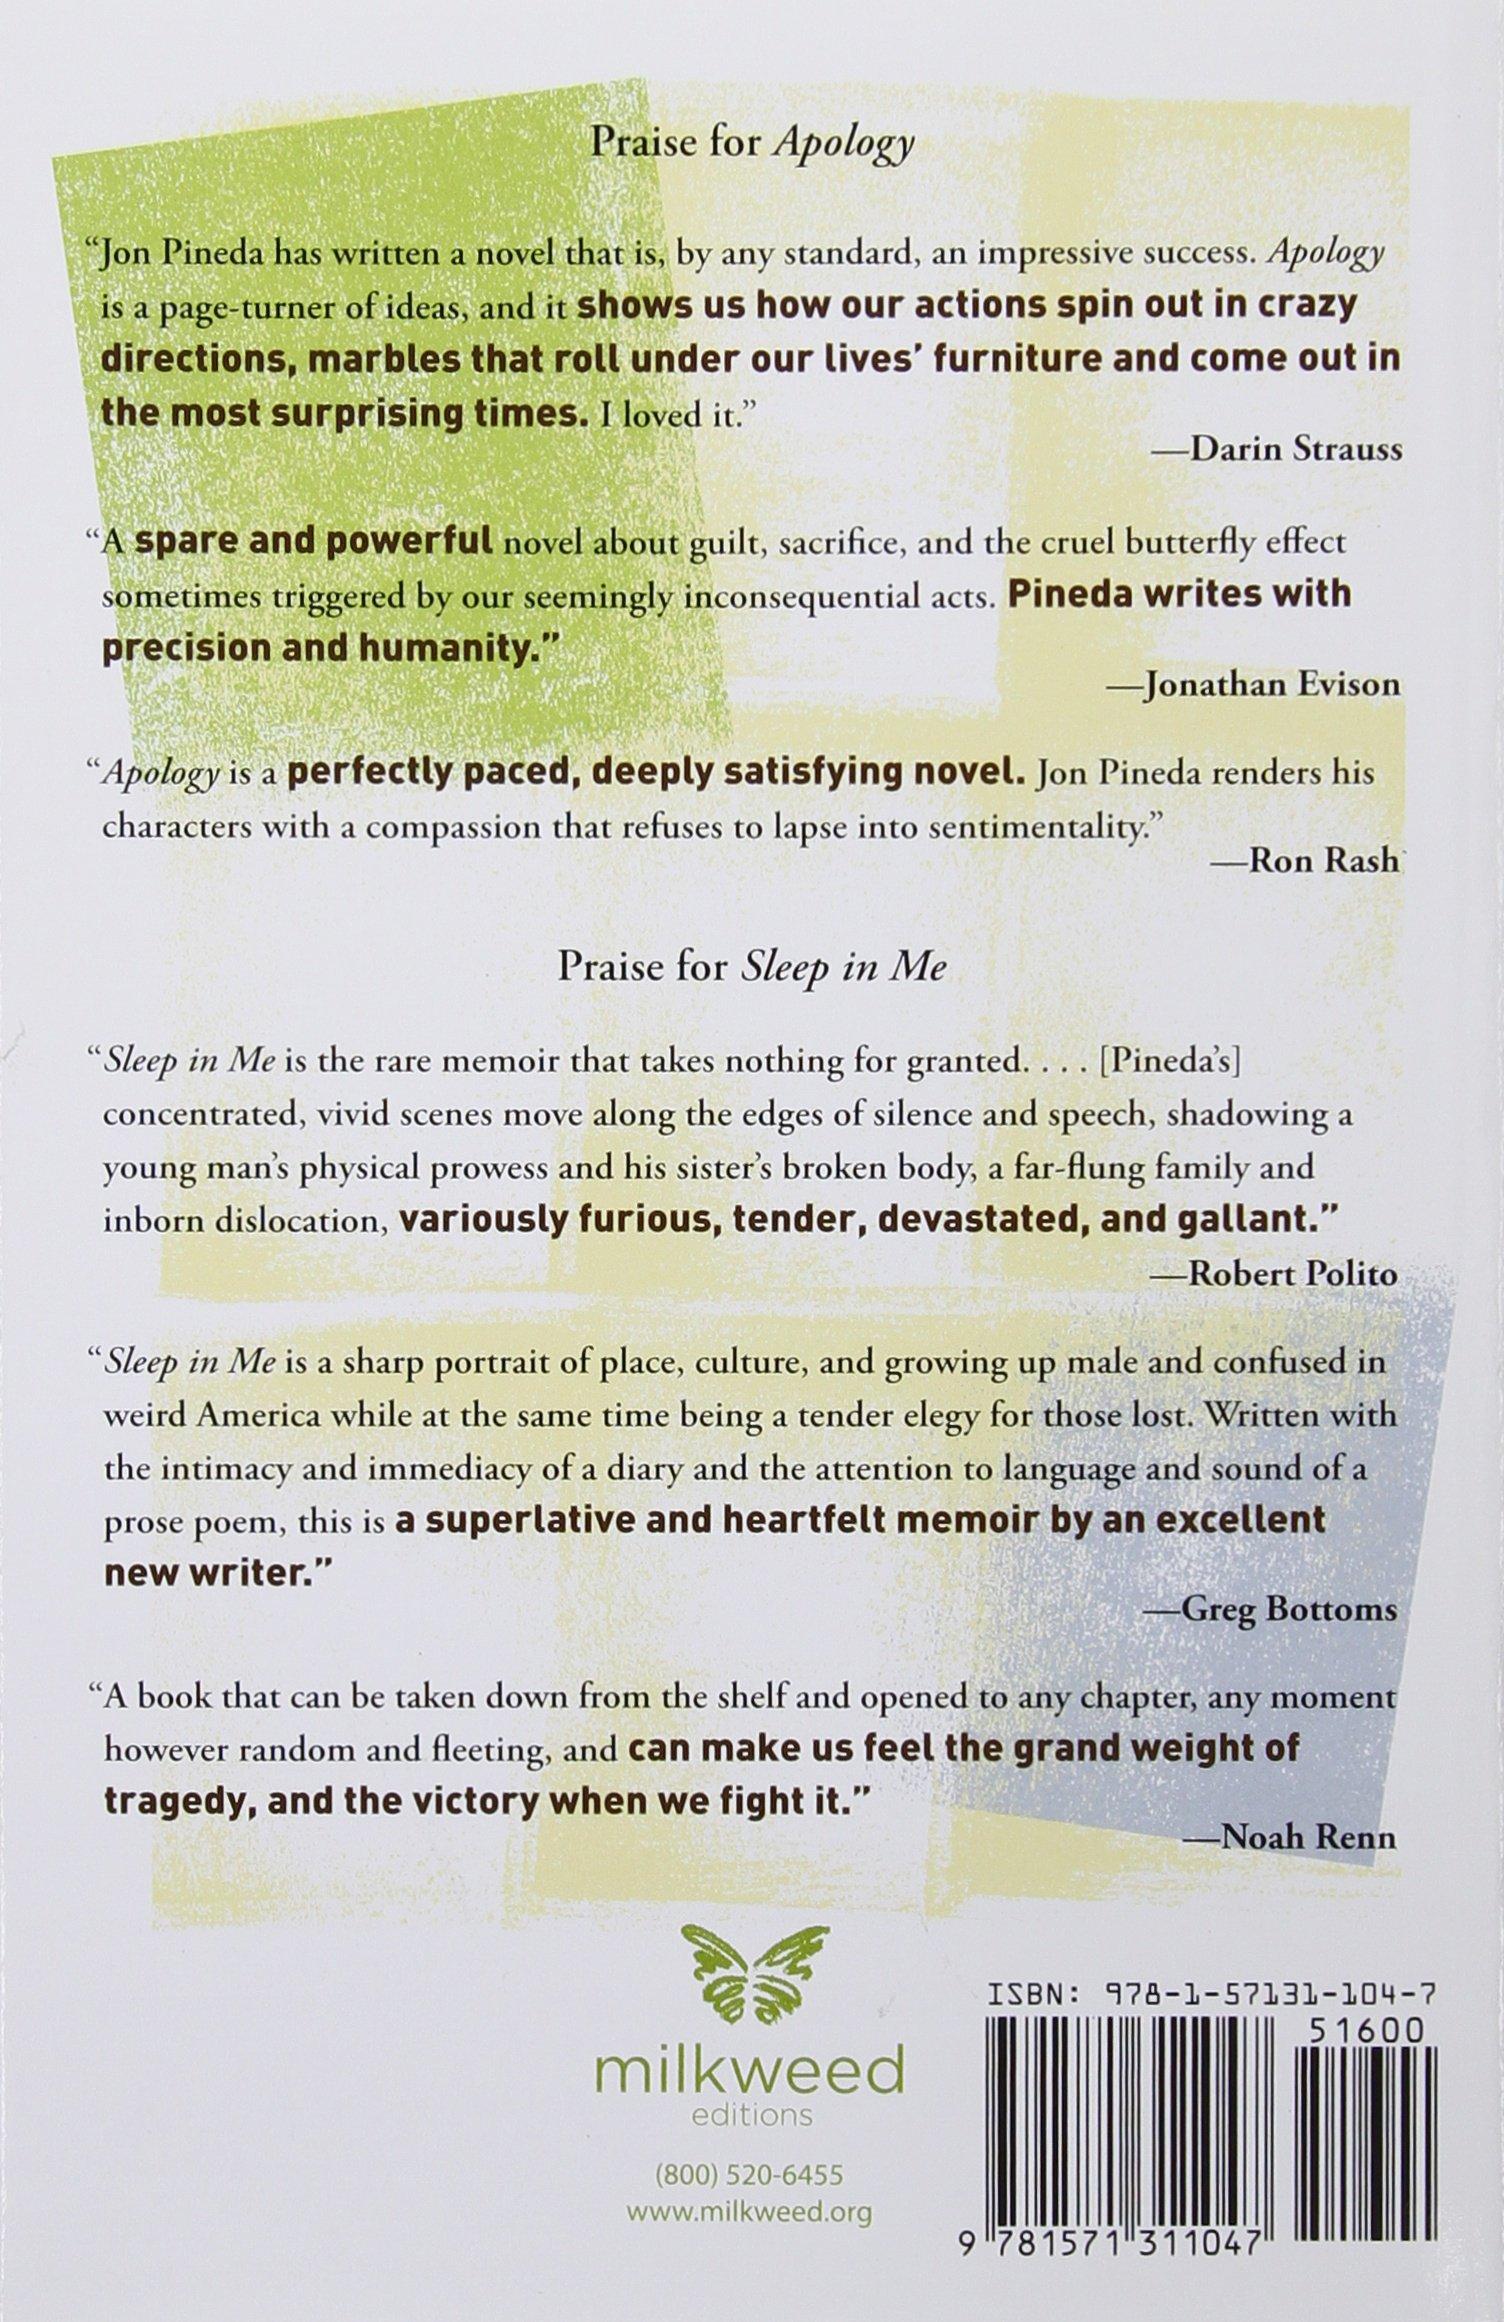 Apology: A Novel (milkweed National Fiction Prize): Jon Pineda:  9781571311047: Amazon: Books